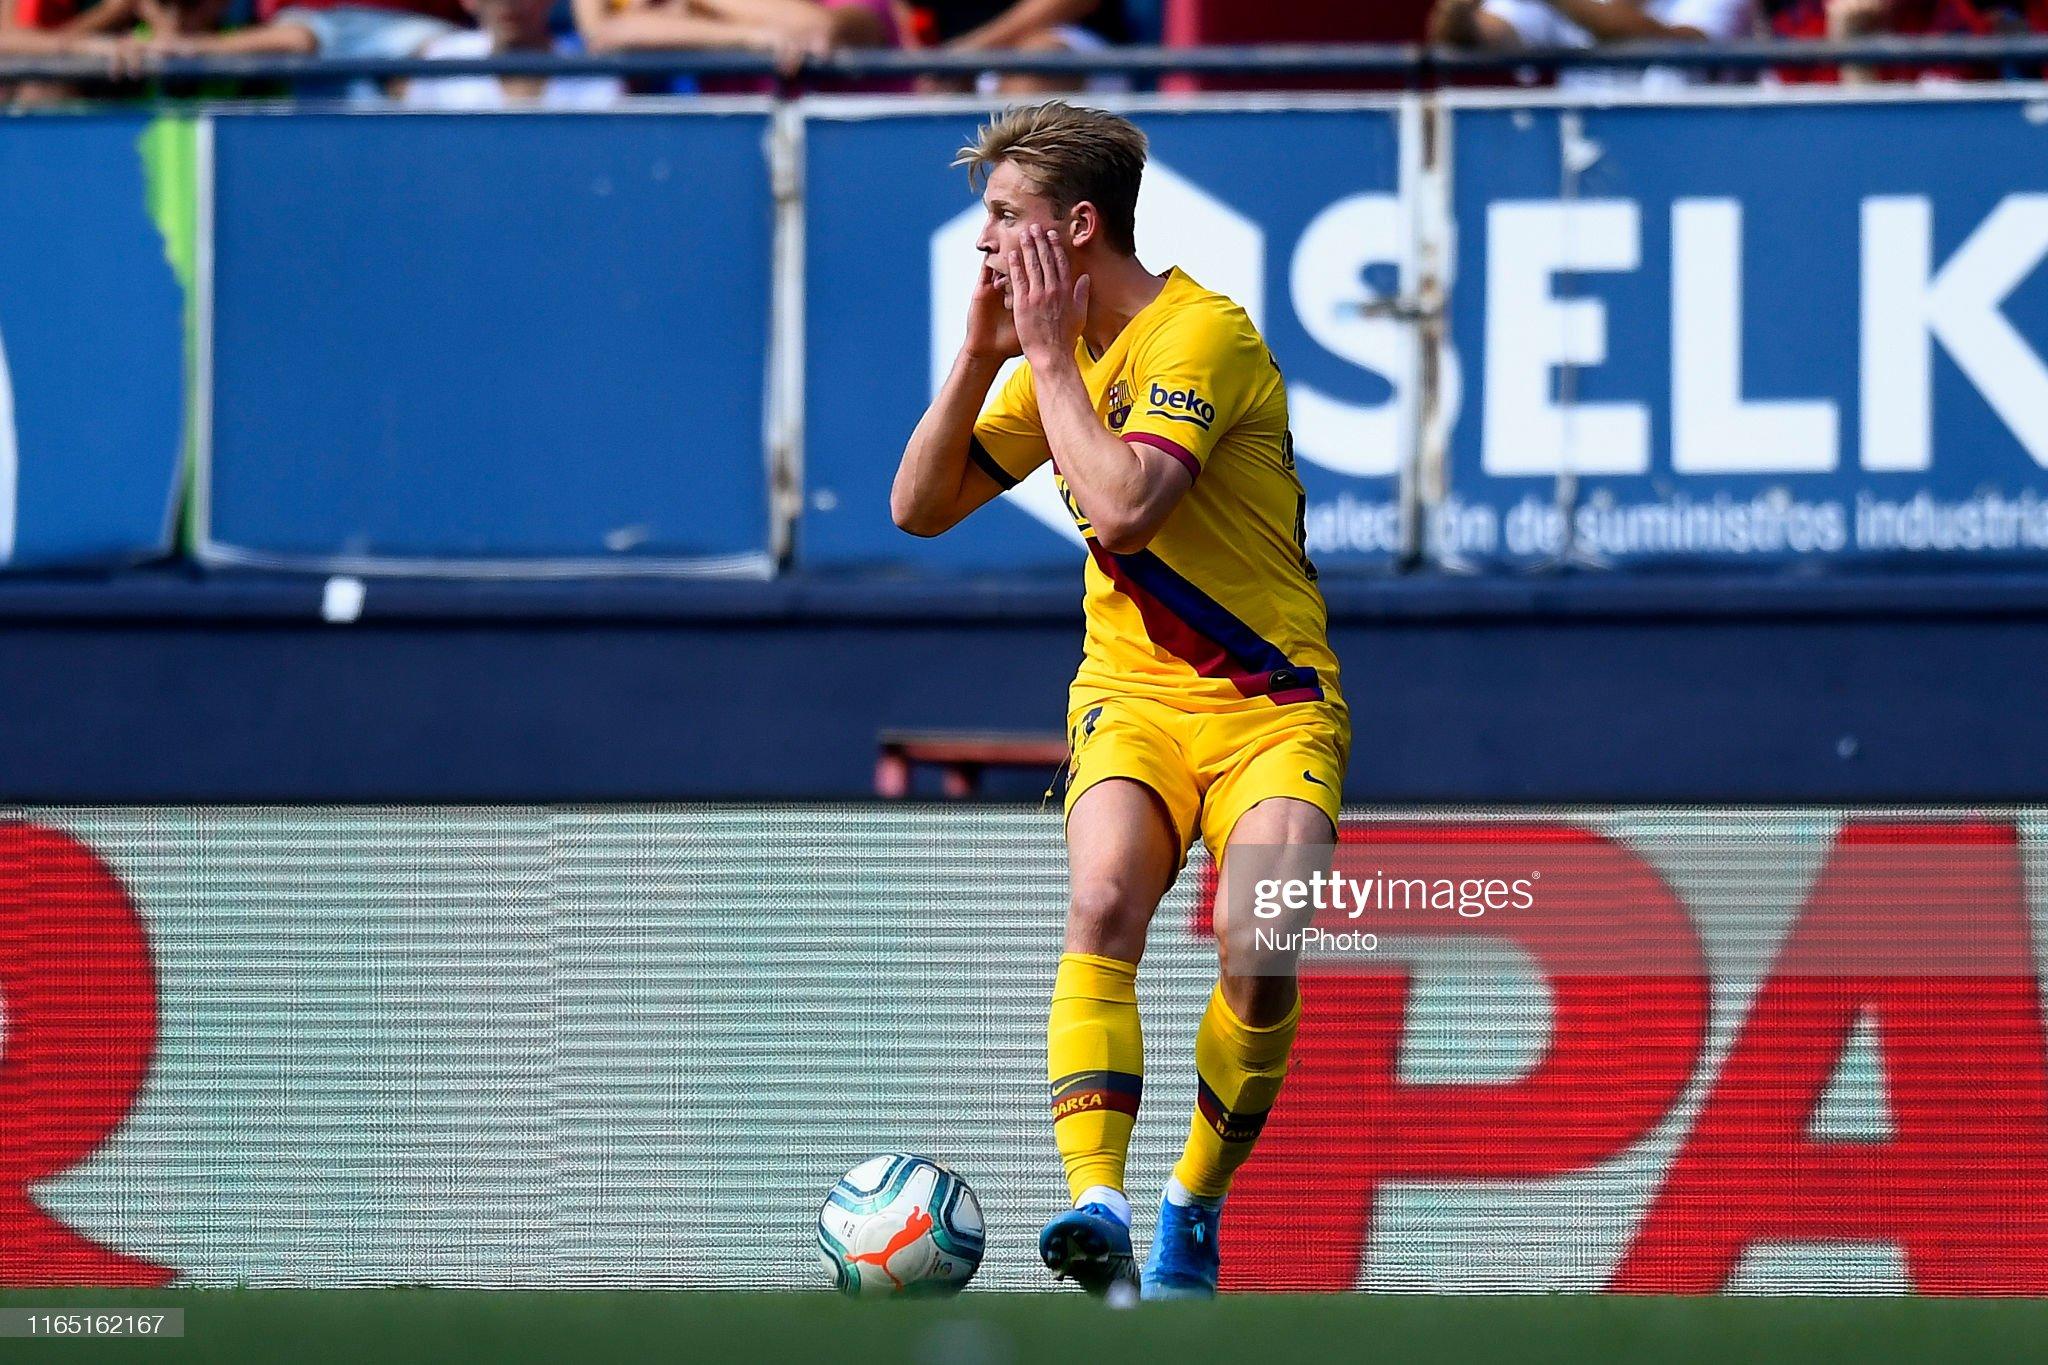 صور مباراة : أوساسونا - برشلونة 2-2 ( 31-08-2019 )  Frenkie-de-jong-of-barcelona-reacts-during-the-liga-match-between-ca-picture-id1165162167?s=2048x2048